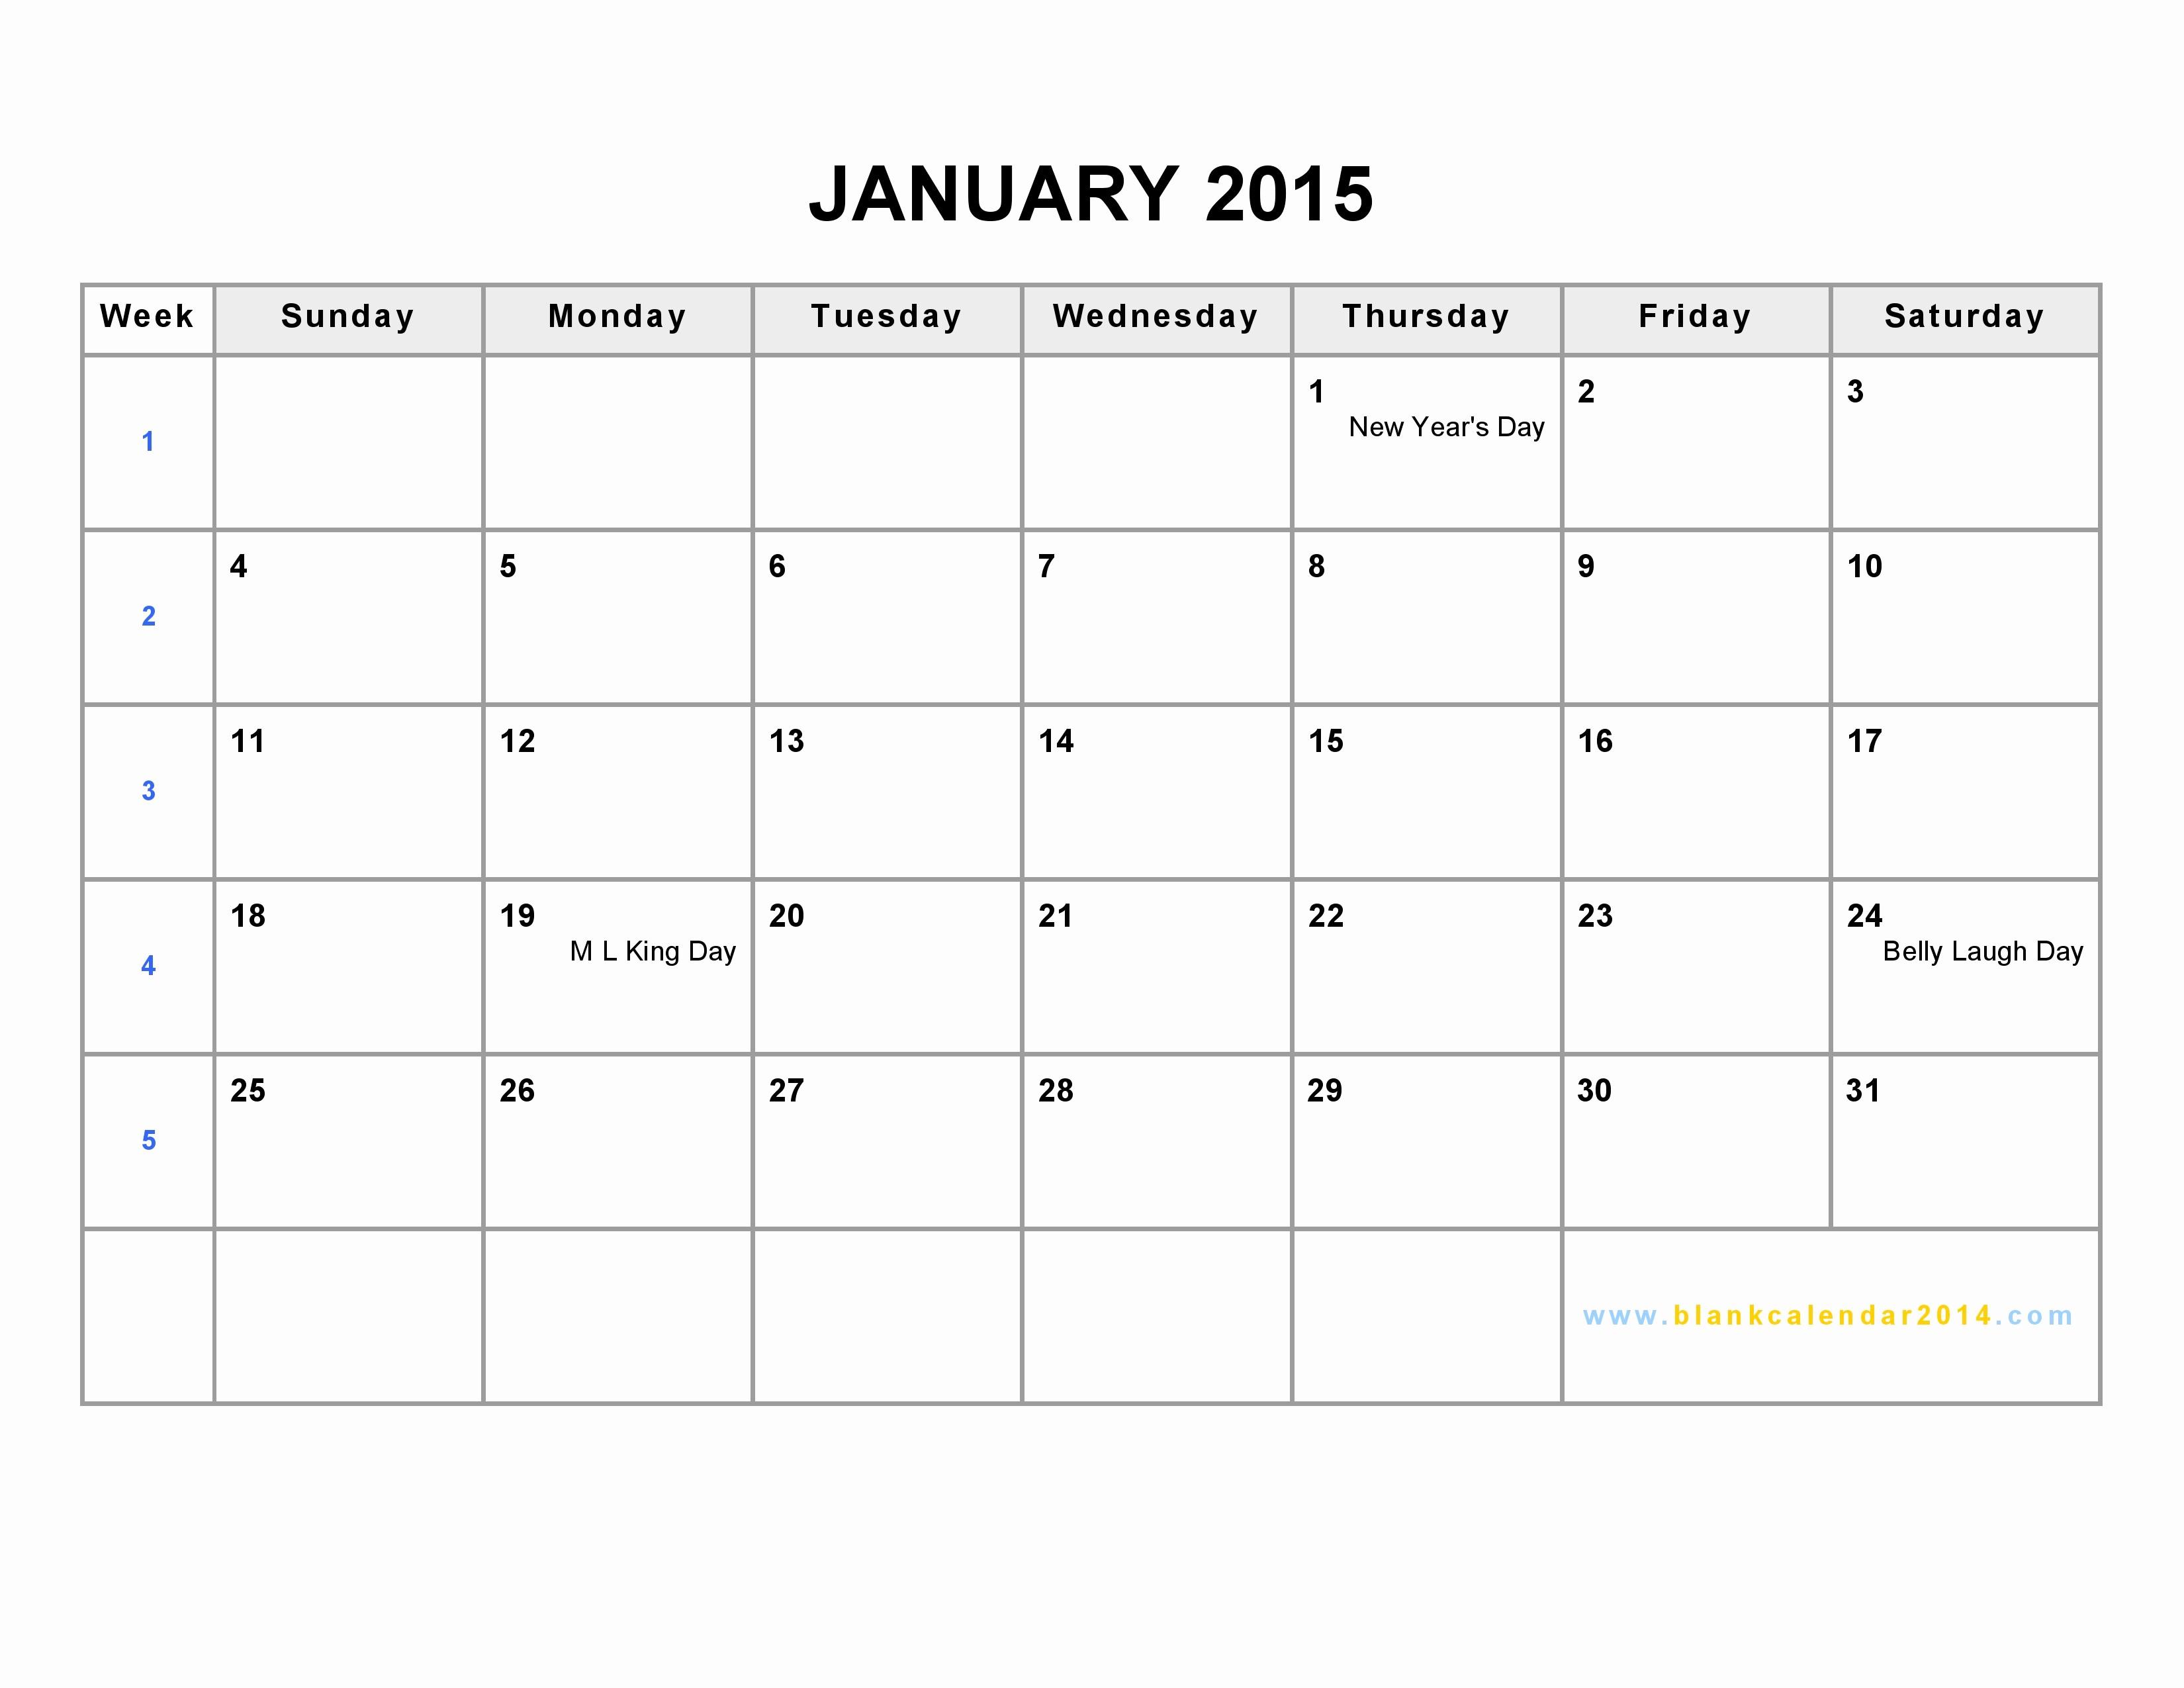 Calendar Of events Template 2015 Inspirational January 2015 Calendar Template